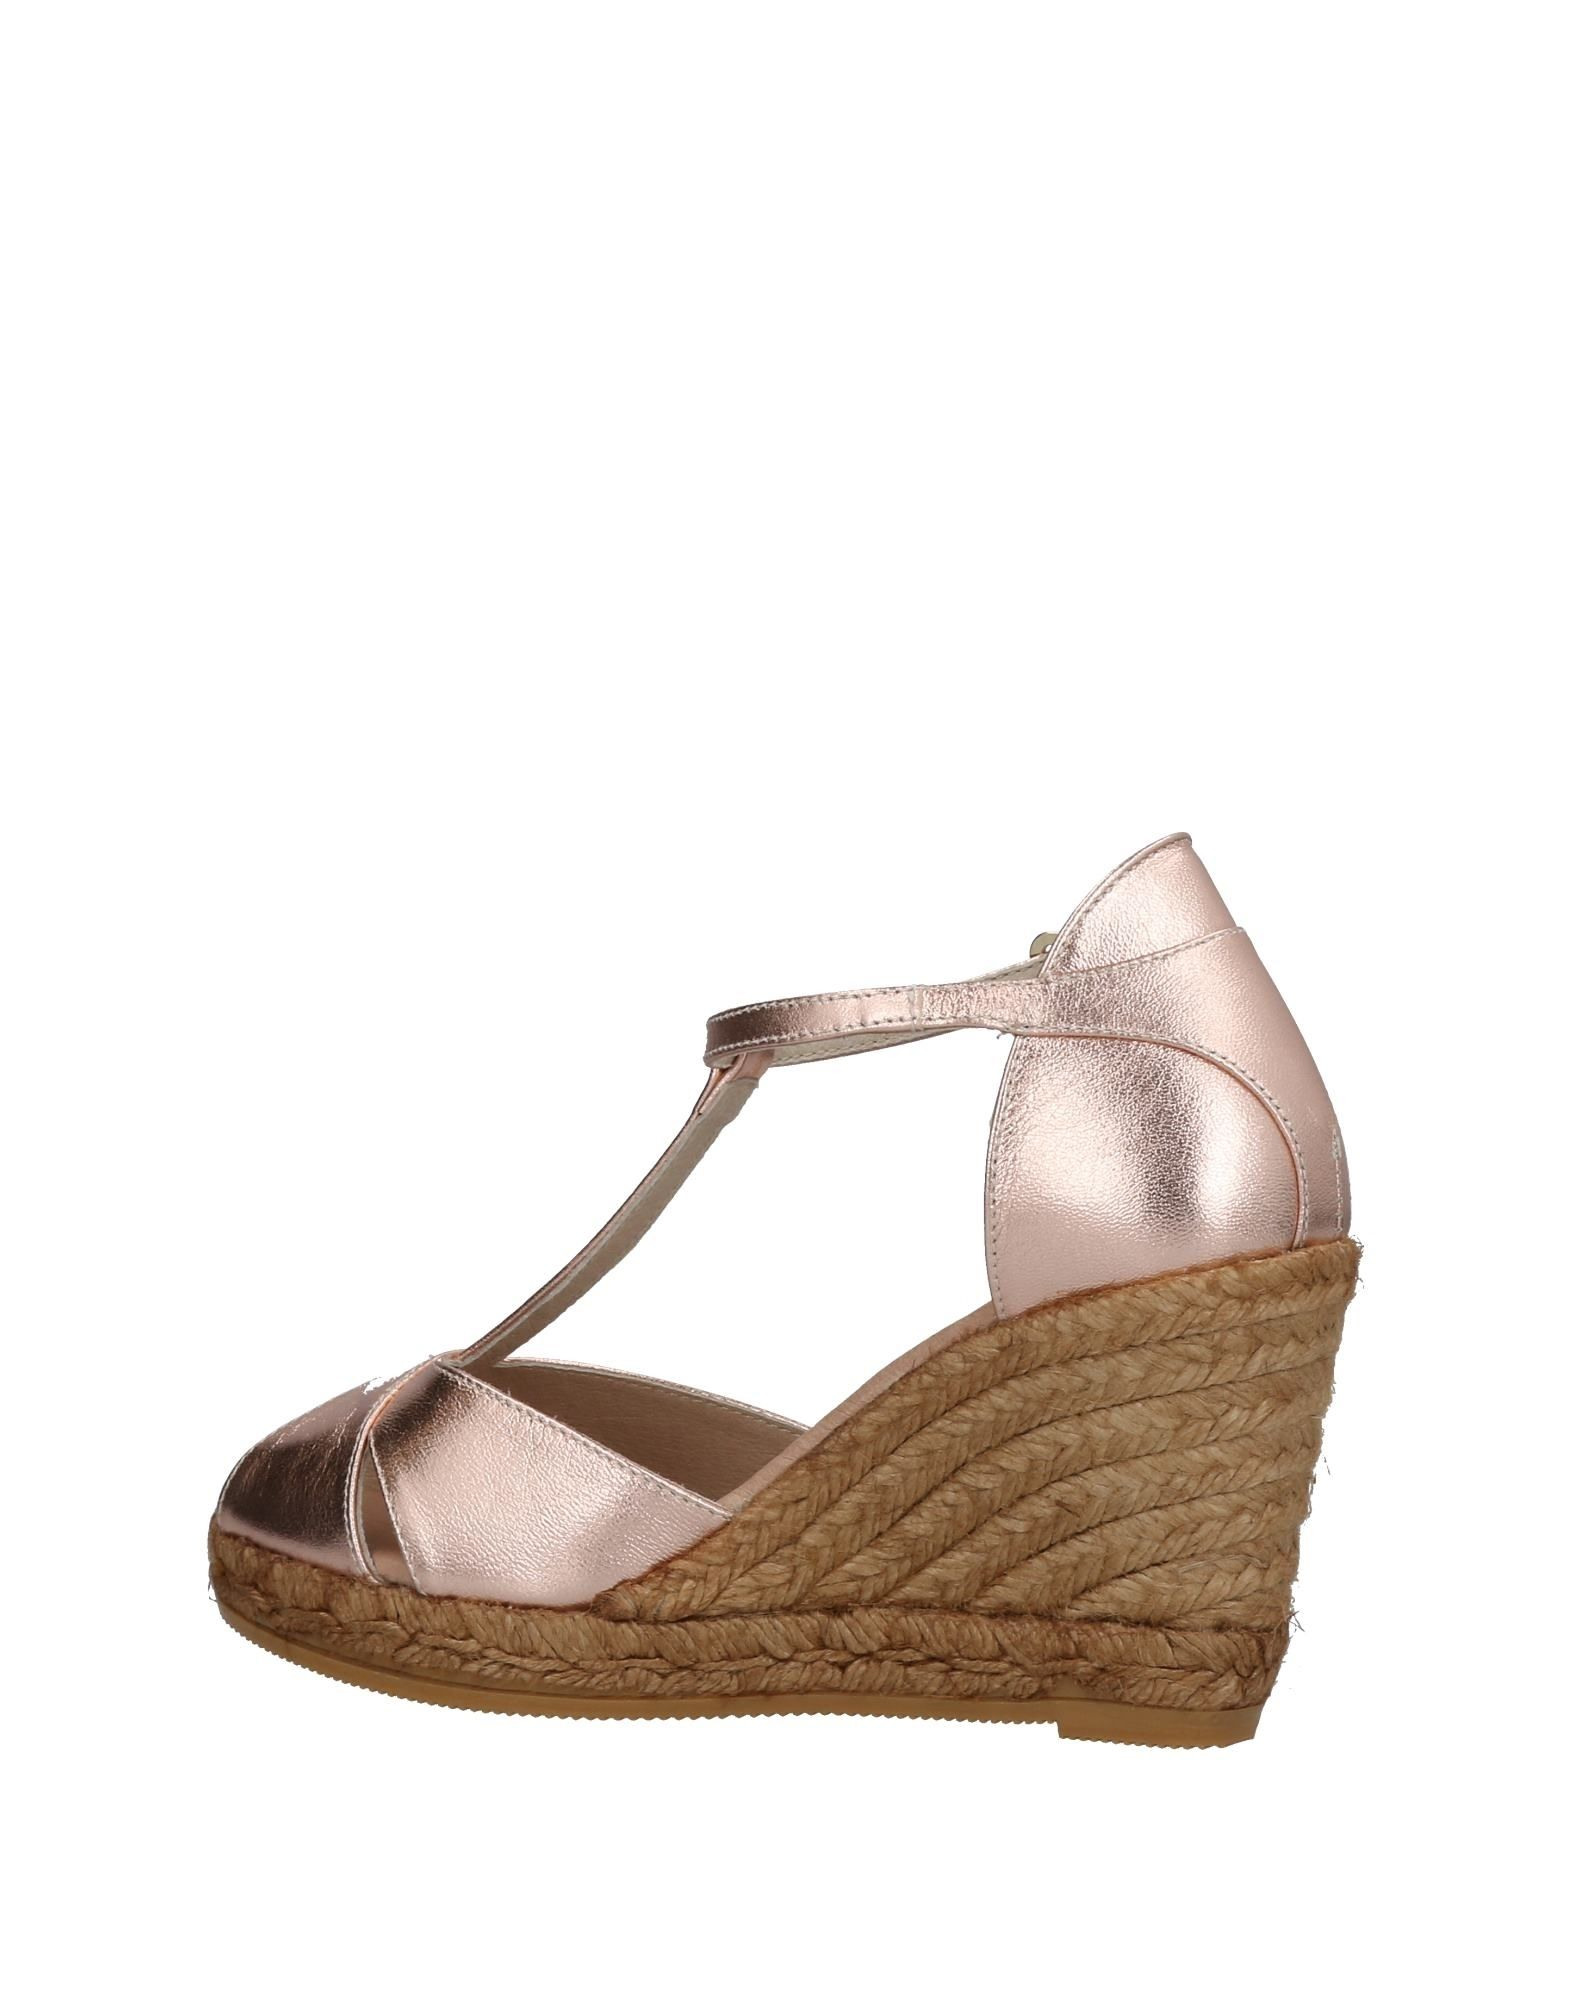 Gaimo Sandalen Damen Damen Sandalen  11447114EU Heiße Schuhe db0715